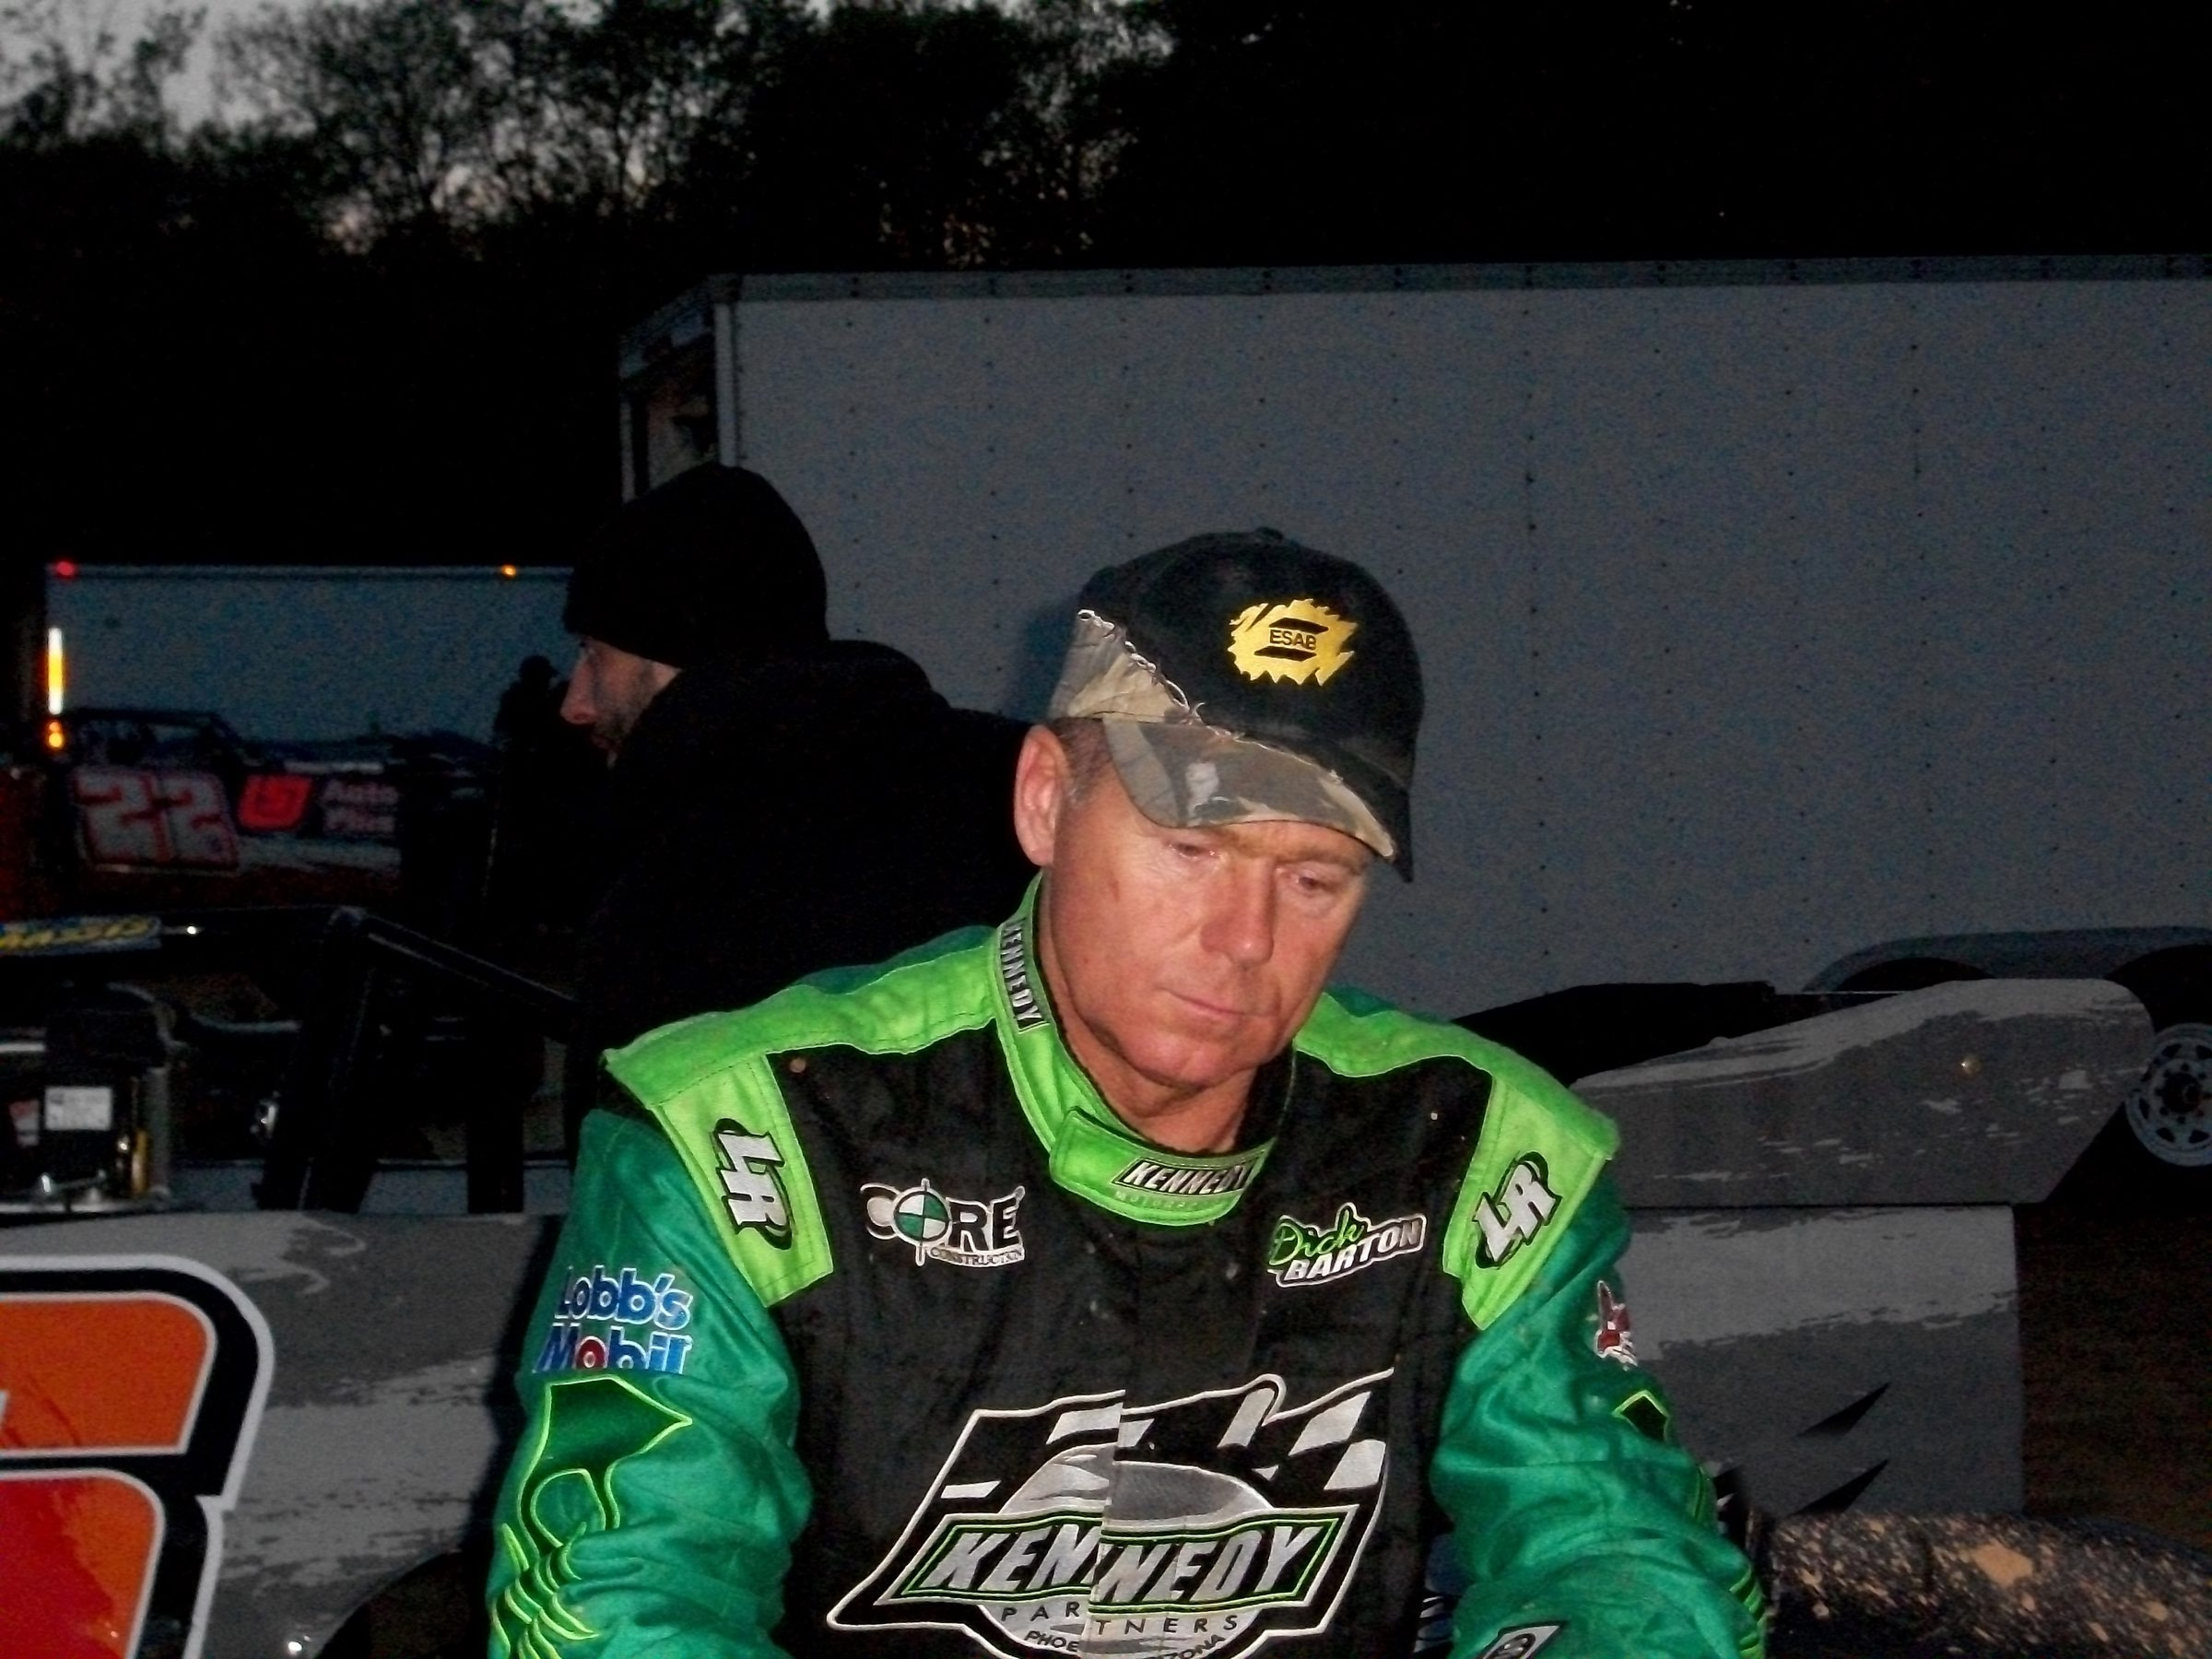 Dick Barton won his 10th Super Late Model season points championship .